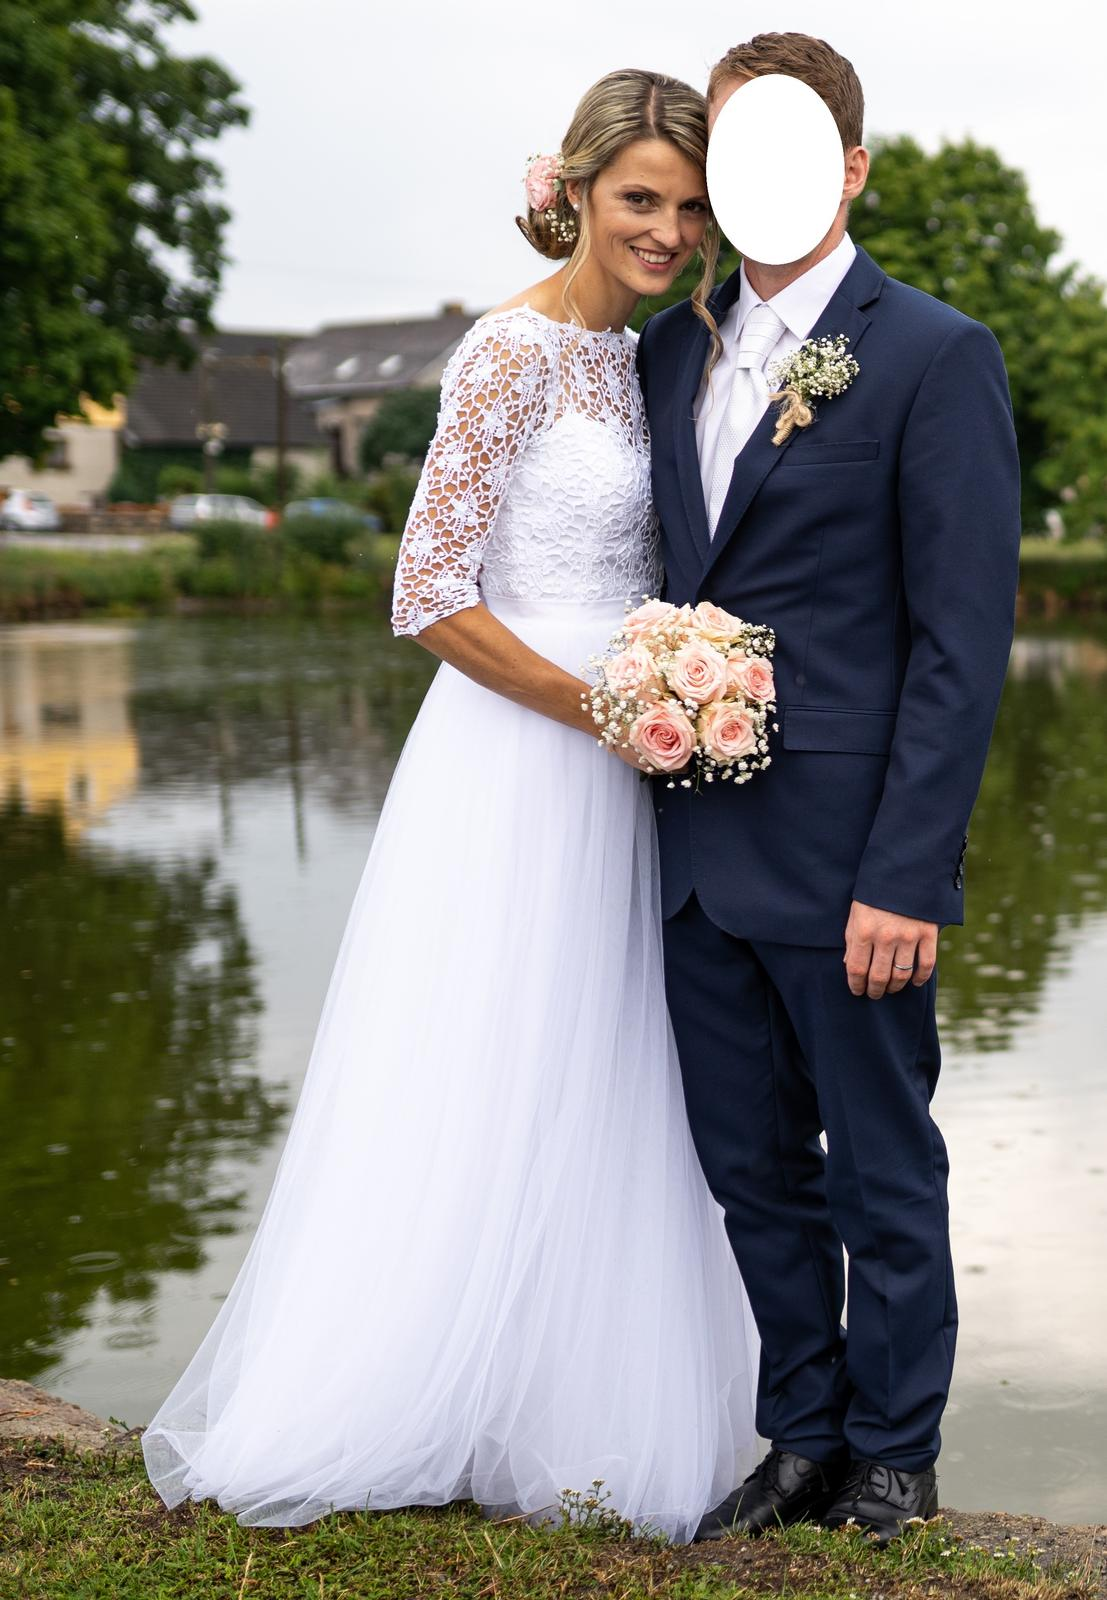 Jemné svatebni šaty - Obrázek č. 1